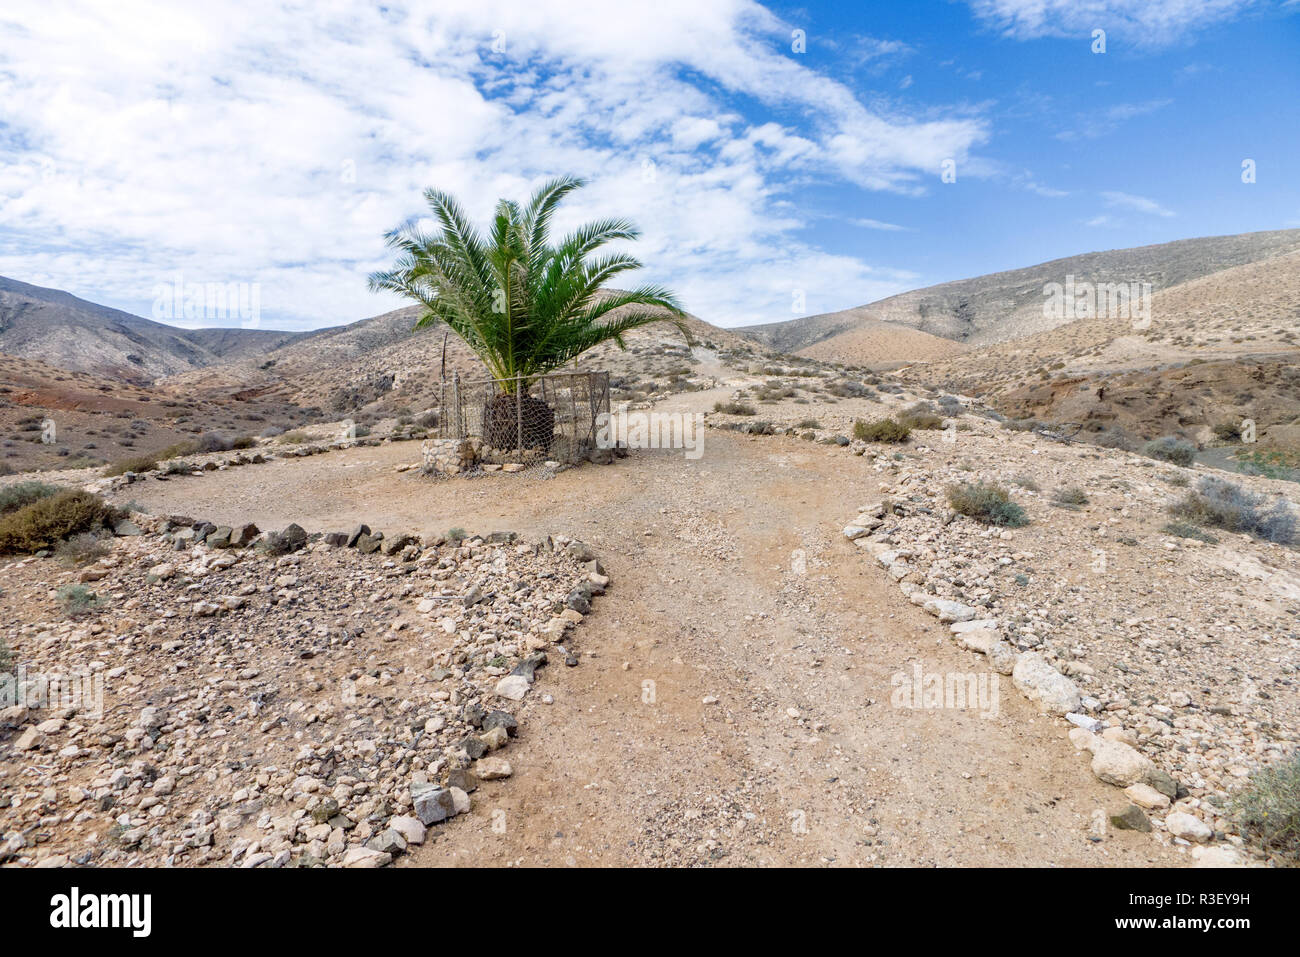 fuerteventura - single palm tree in cardon solid Stock Photo